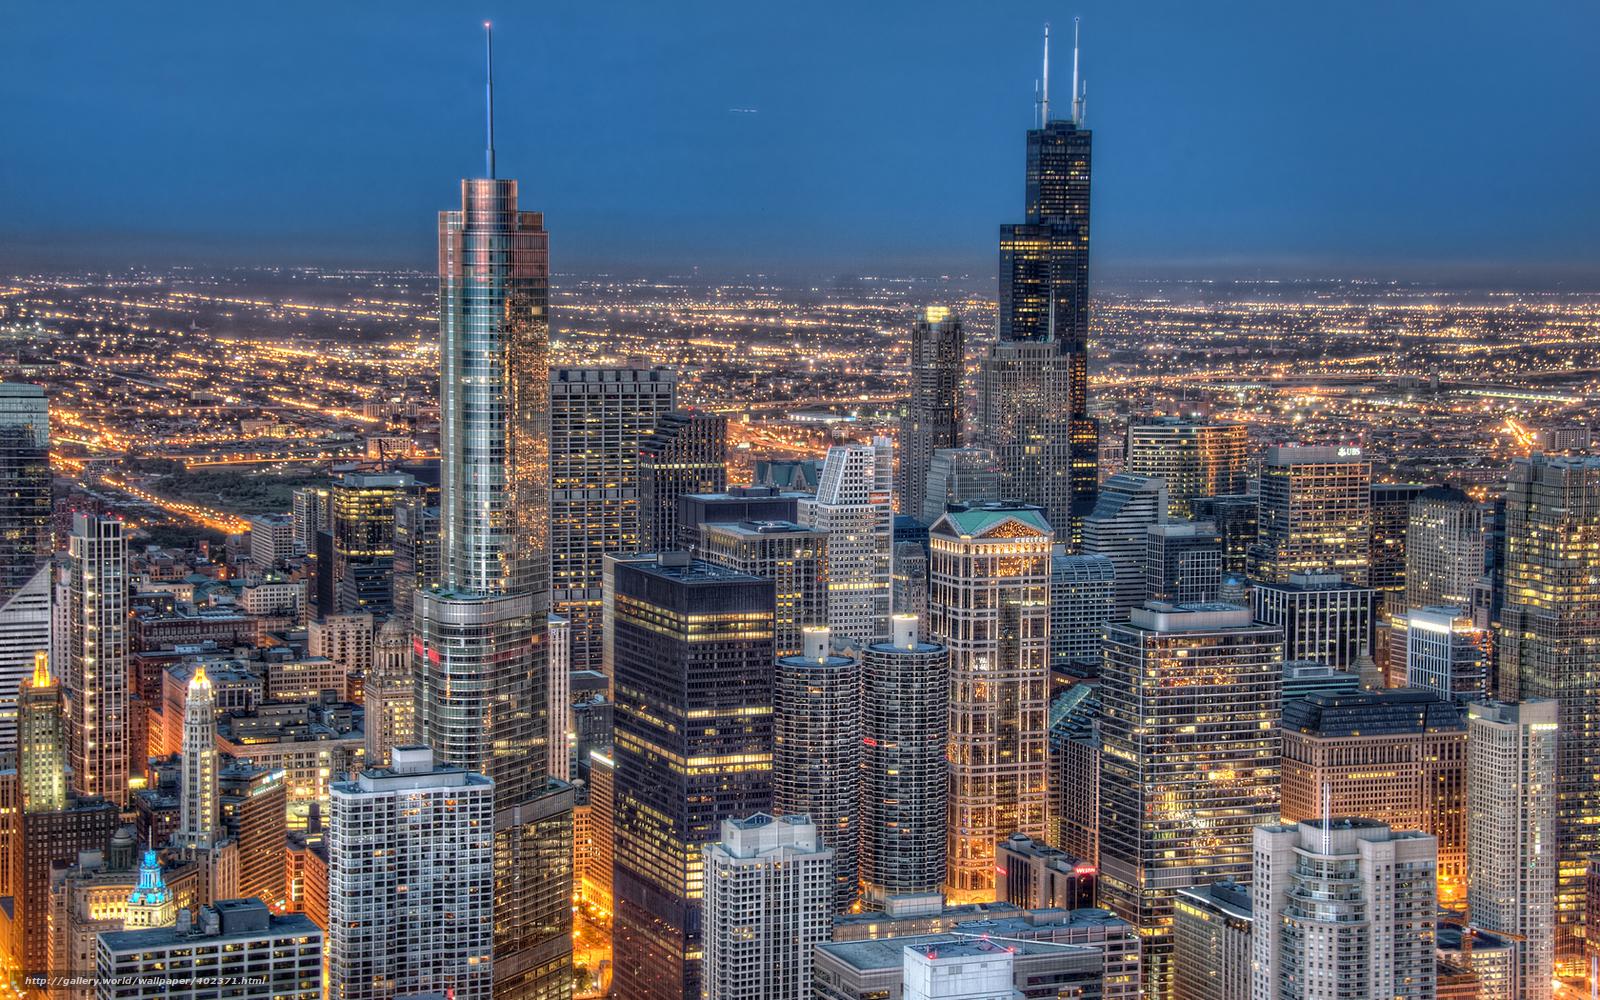 Download wallpaper Chicago Illinois night desktop 1600x1000